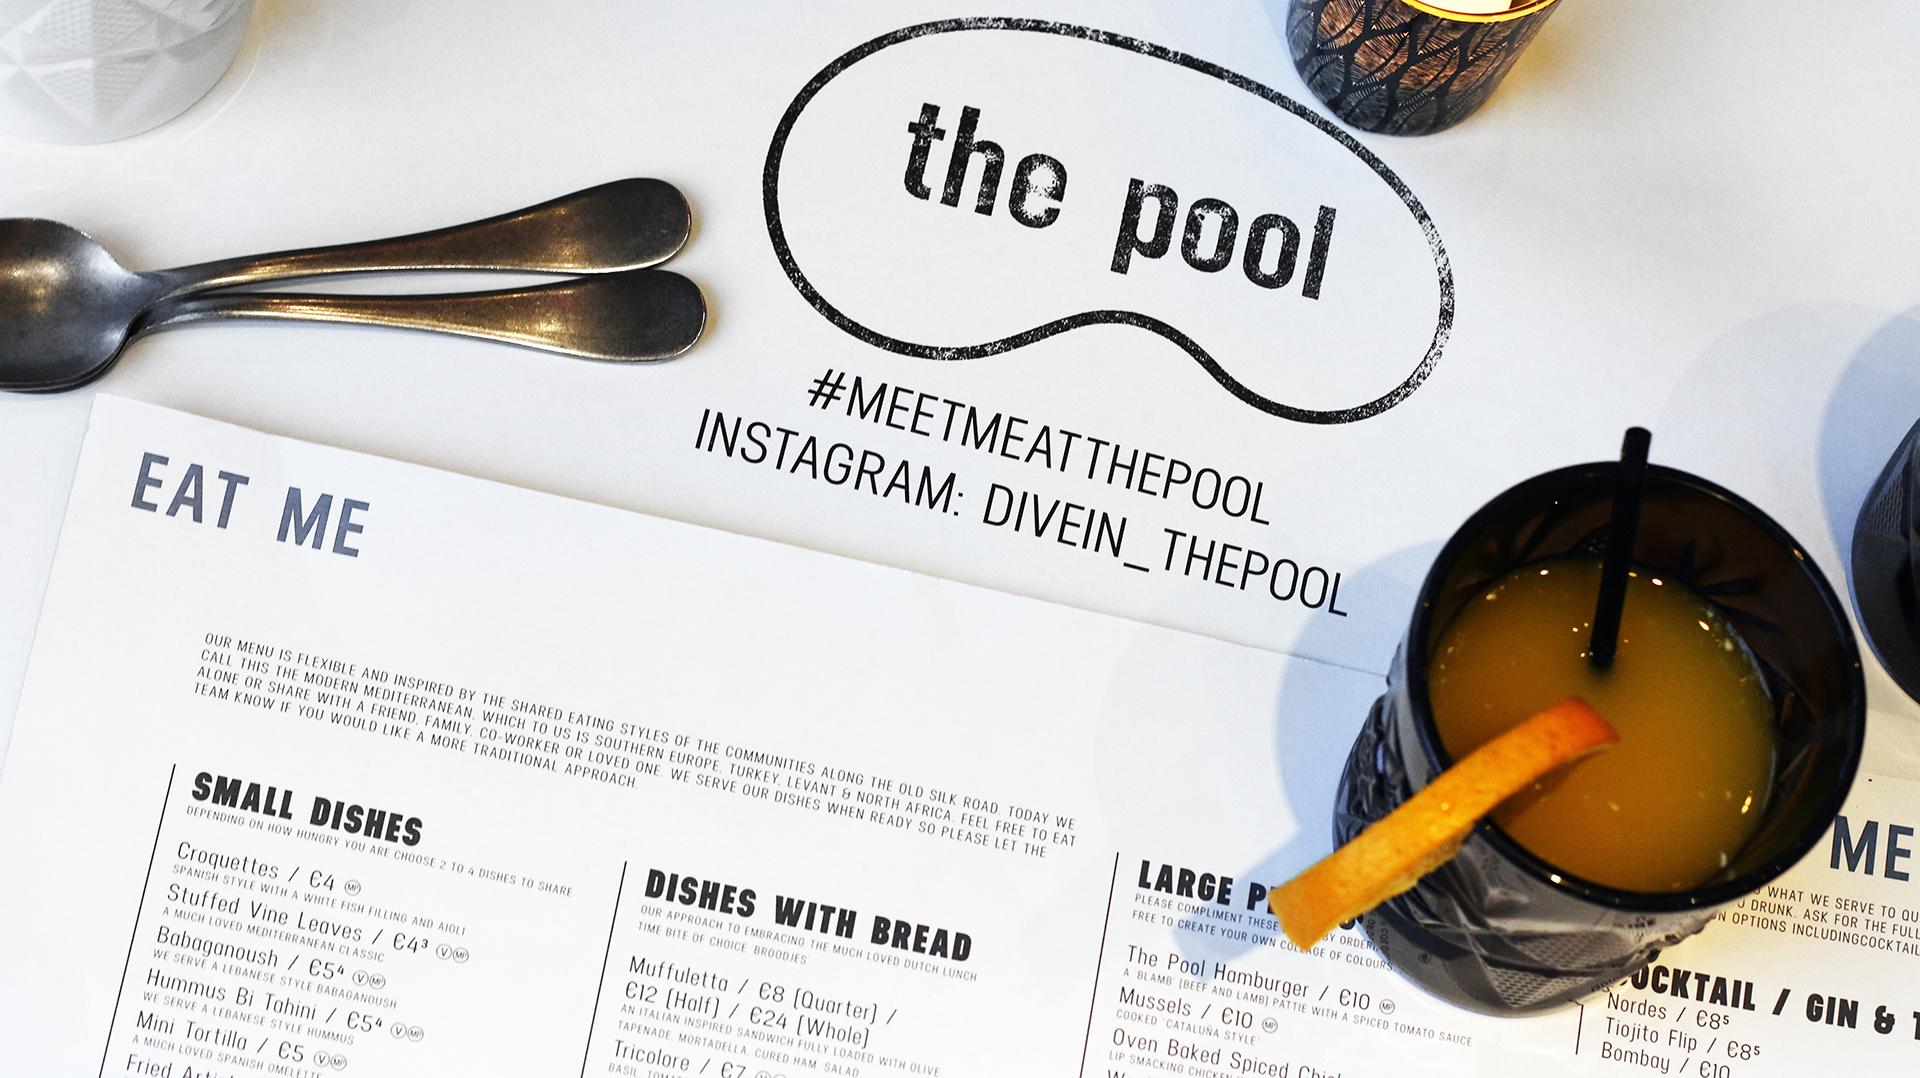 HOTSPOT | The Pool Groningen